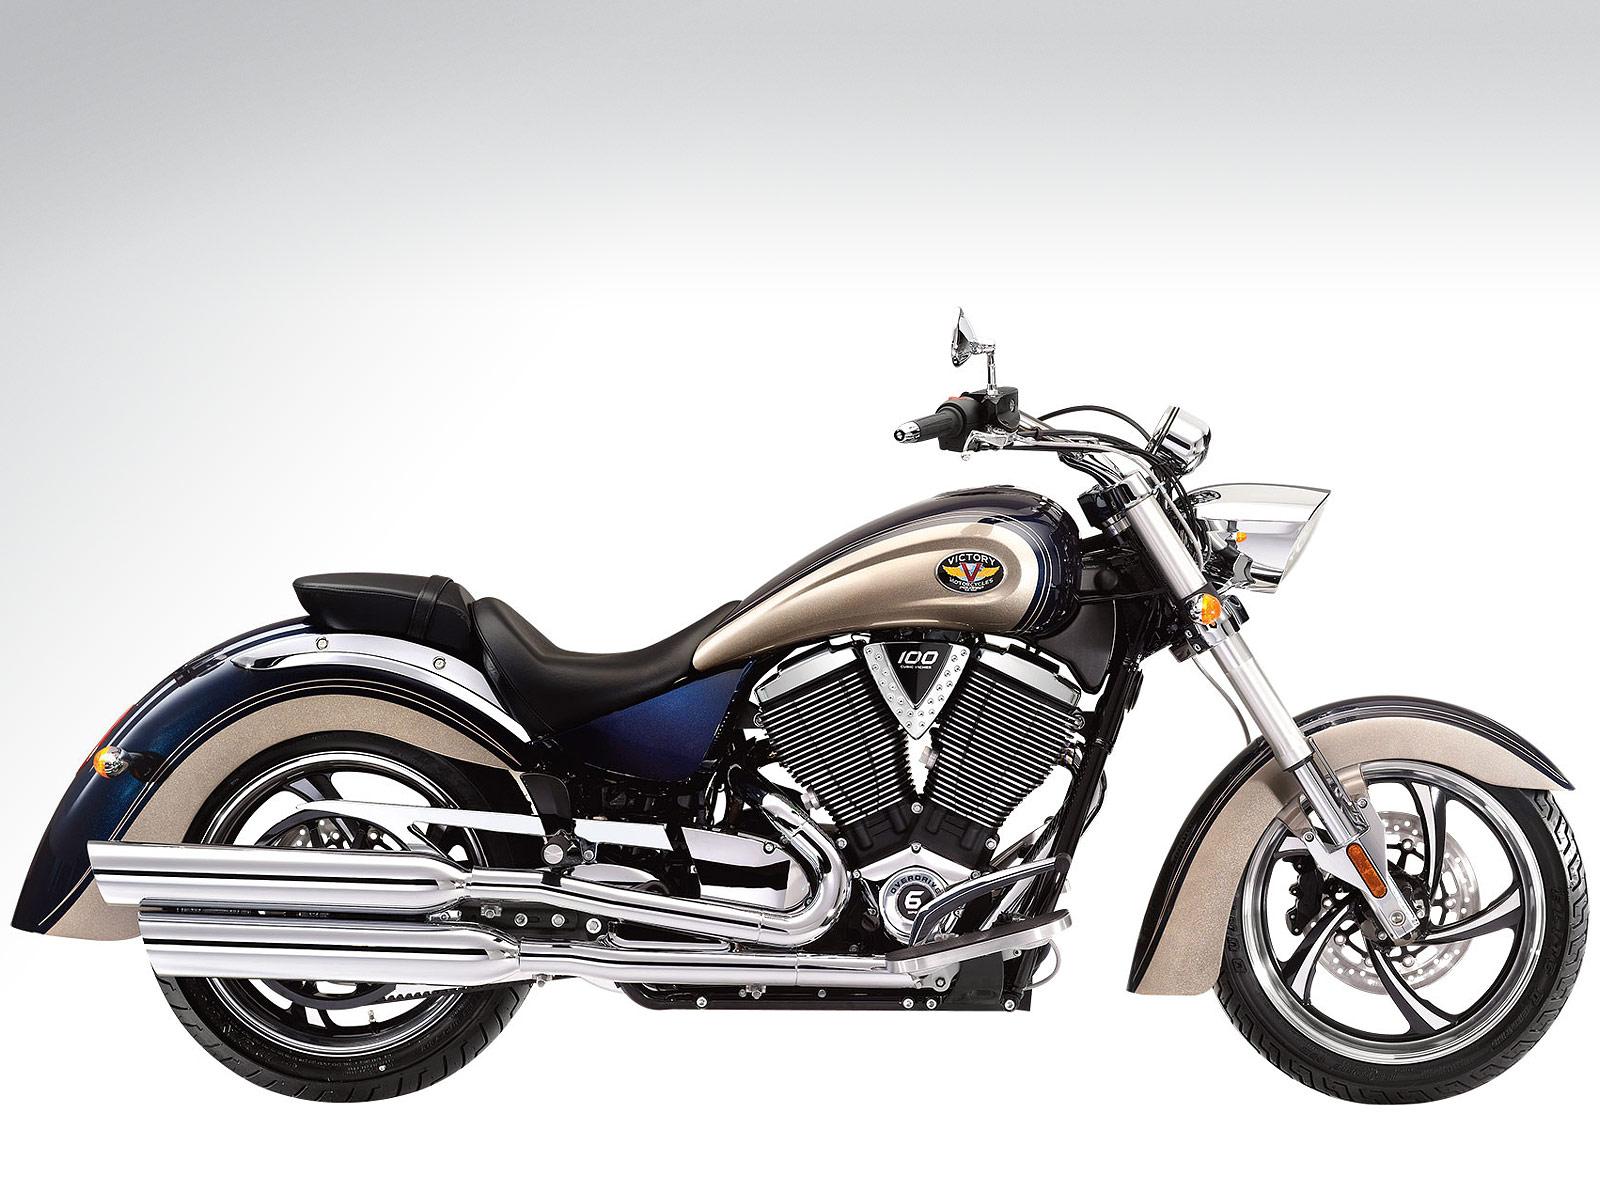 Gambar Motor Victory Kingpin 2010 Motorcycle Insurance Info